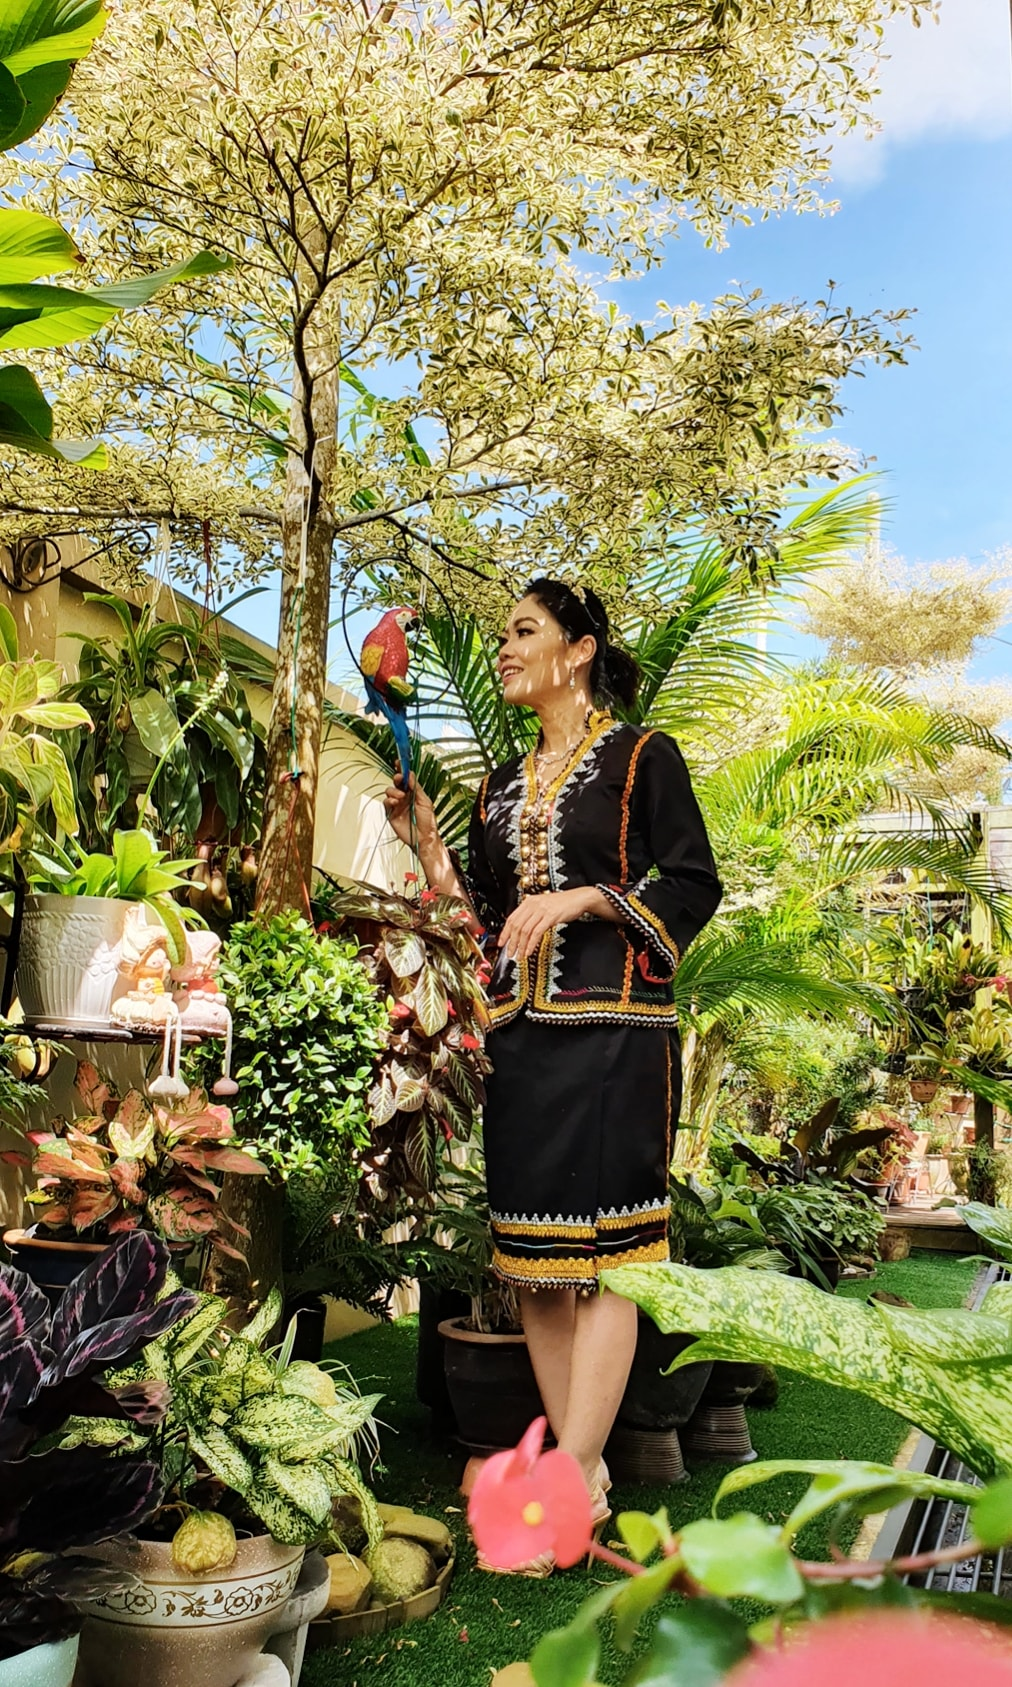 Rajin Berhias Pakai Busana Tradisi Sabah Masa Kelas, Kecantikan Guru Ni Memukau